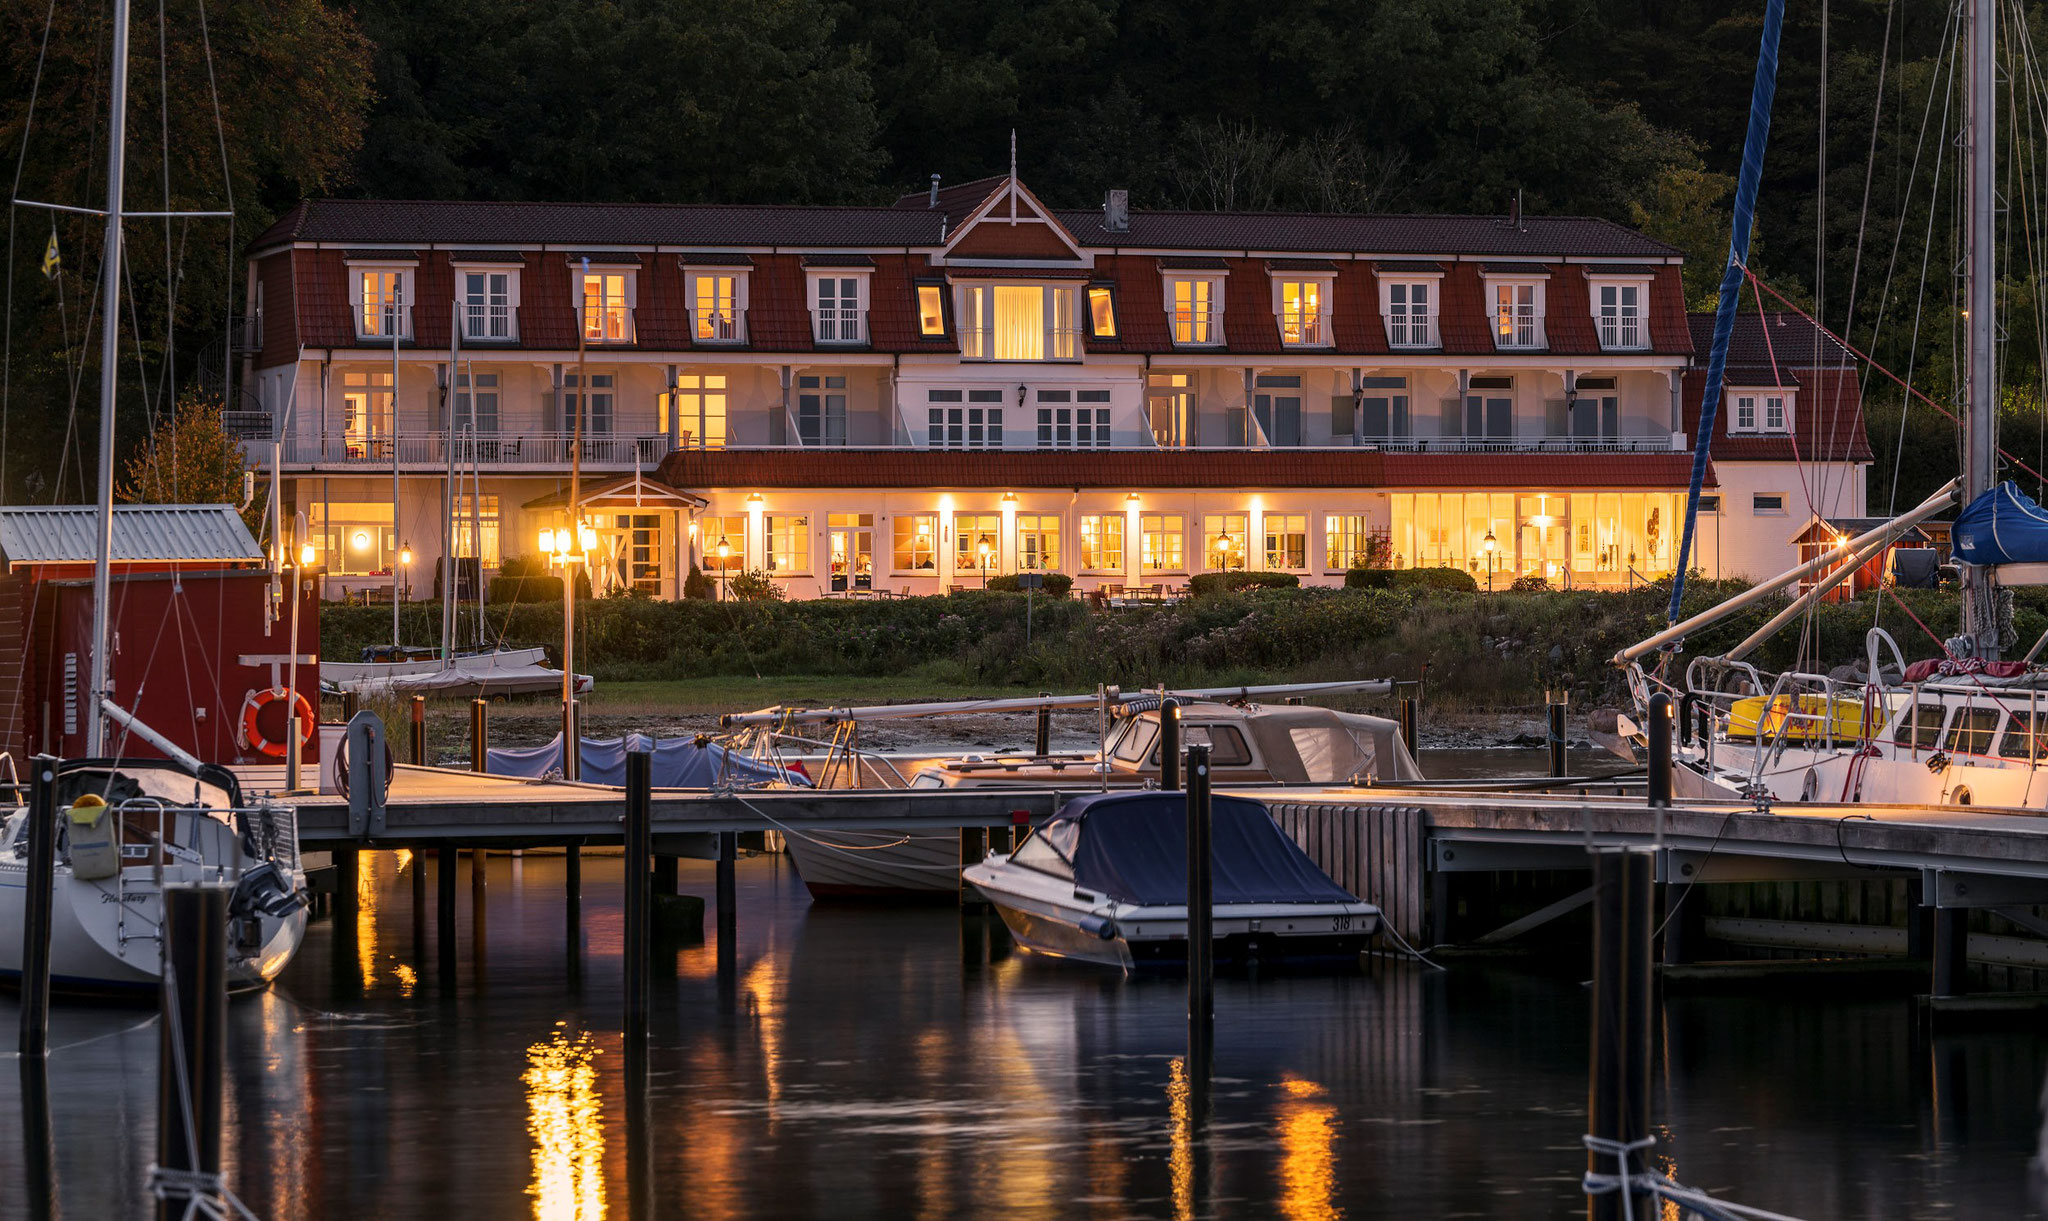 Hotel Wassersleben ©Ydo Sol Images